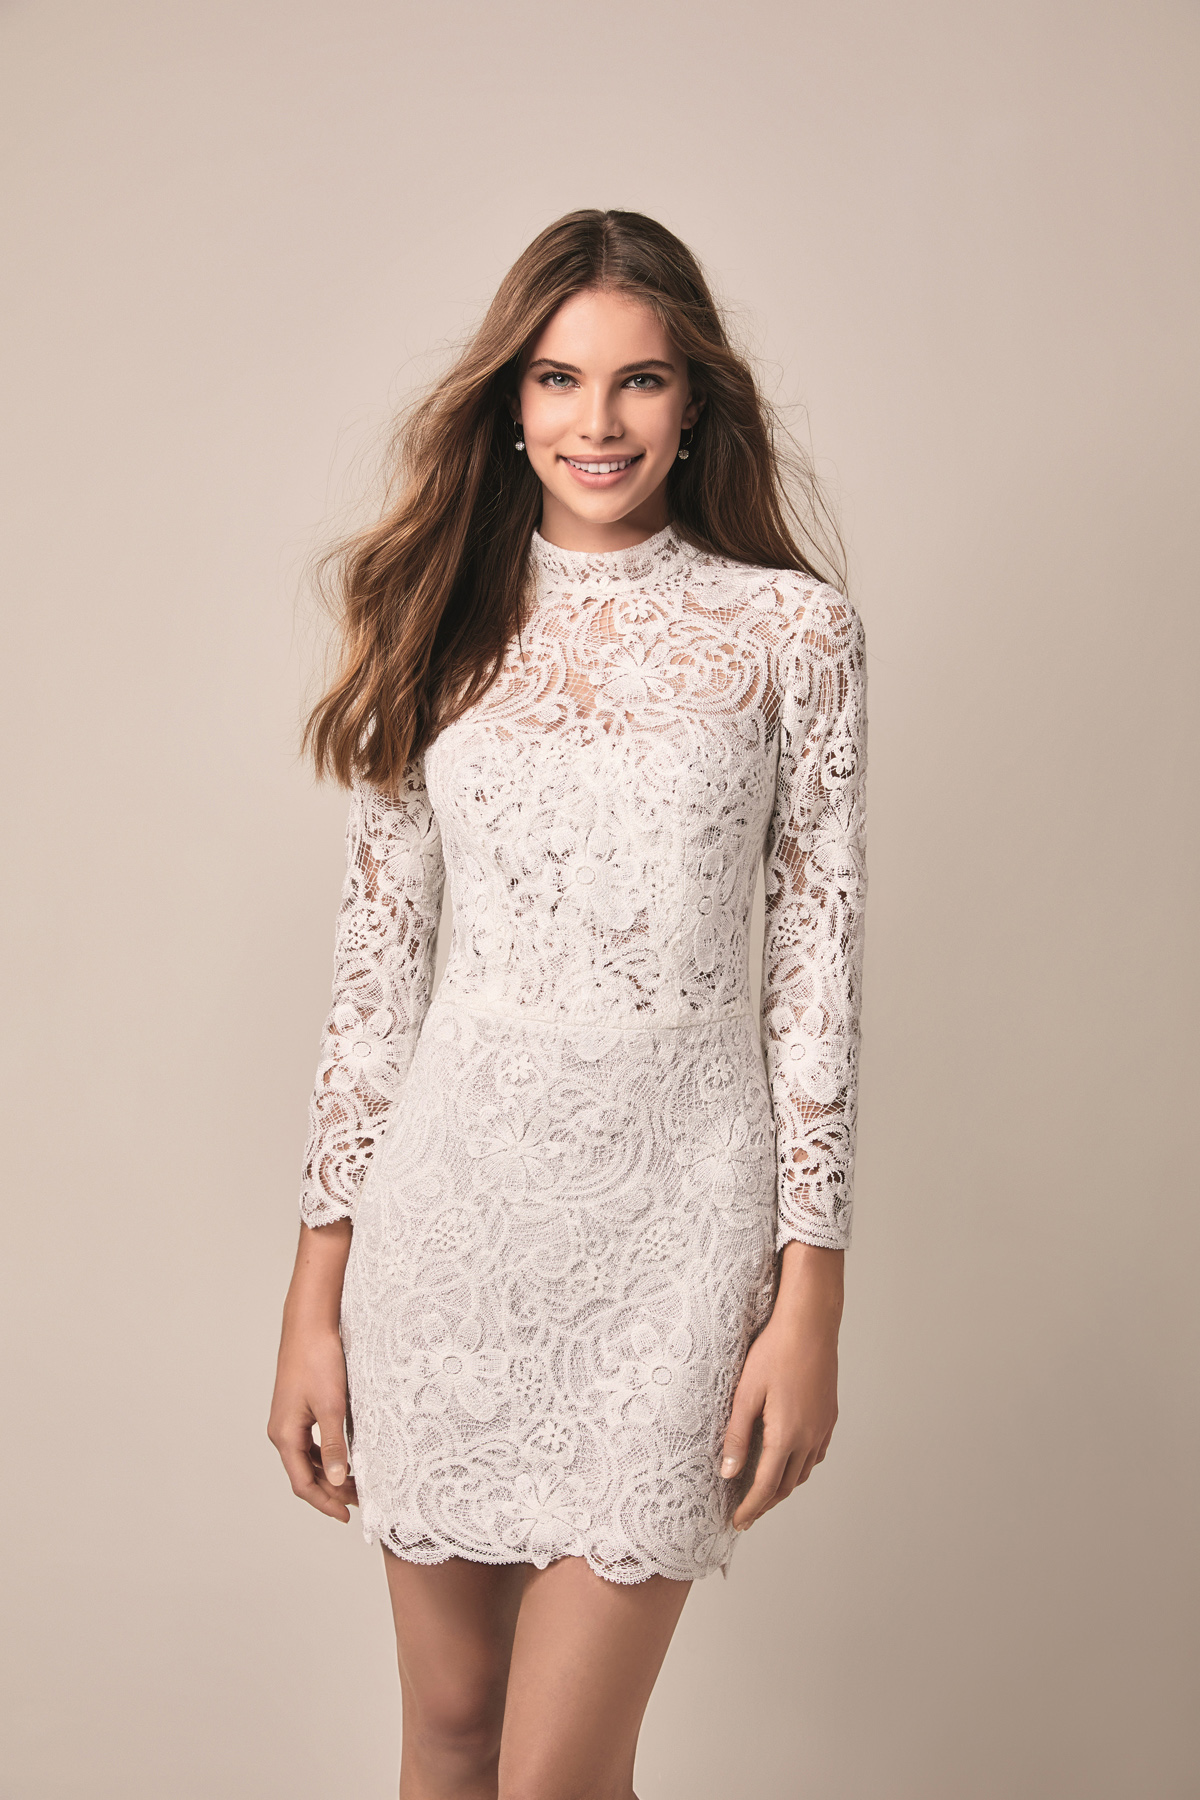 aa30d419b95 Spring Wedding Dresses by Jesus Peiro  seasonal style from the ...